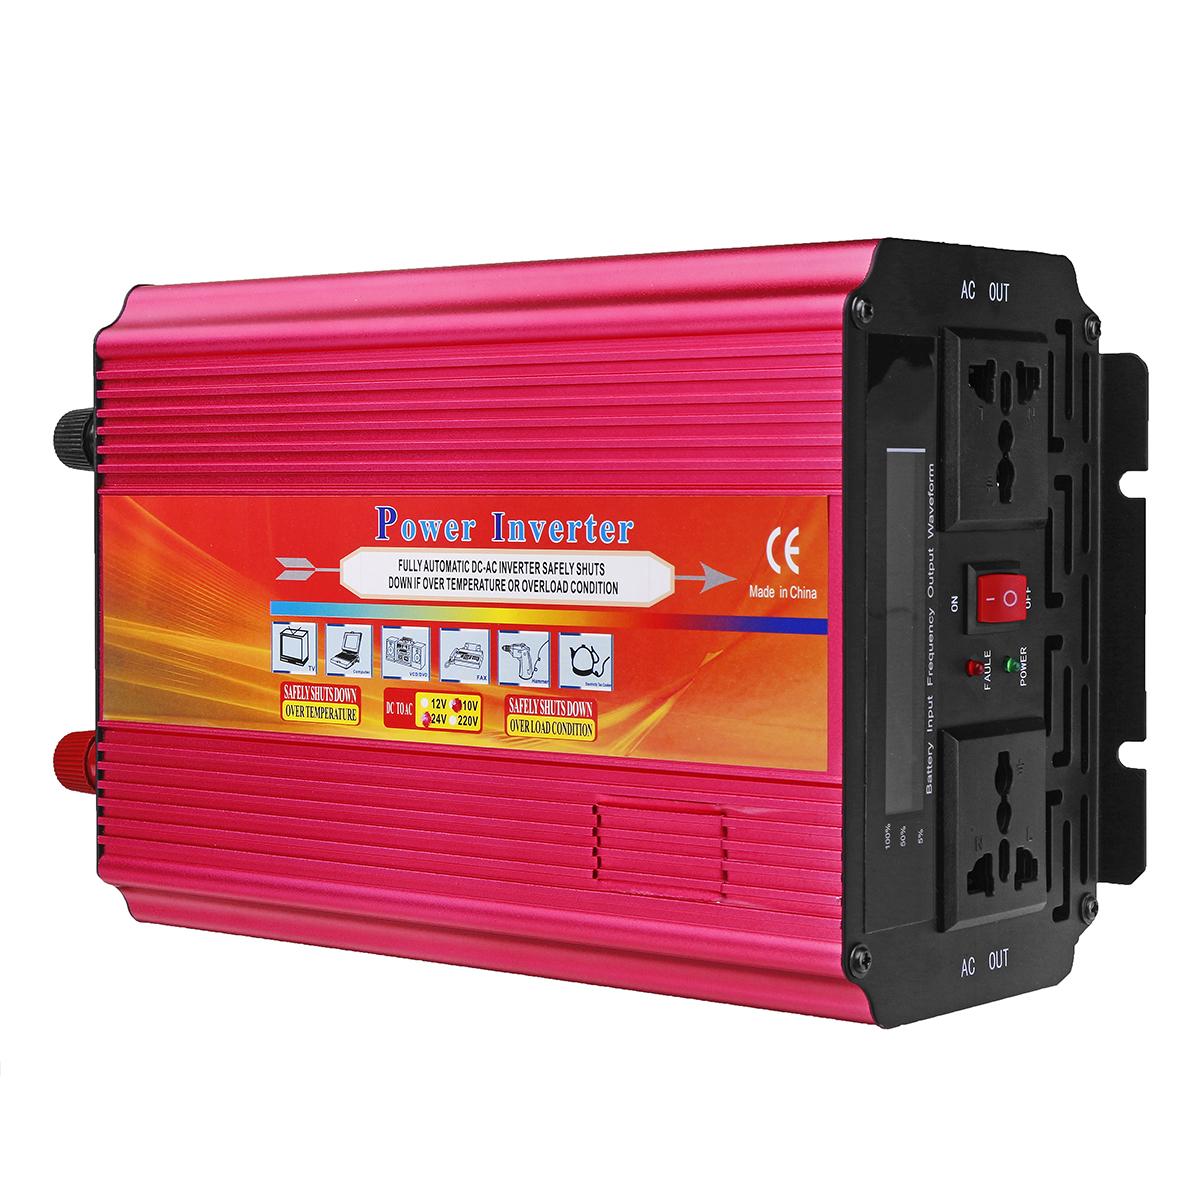 LCD Power Inverter DC 12V/24V to AC 110V/220V 6000W Peak Modified Sine Wave Converter